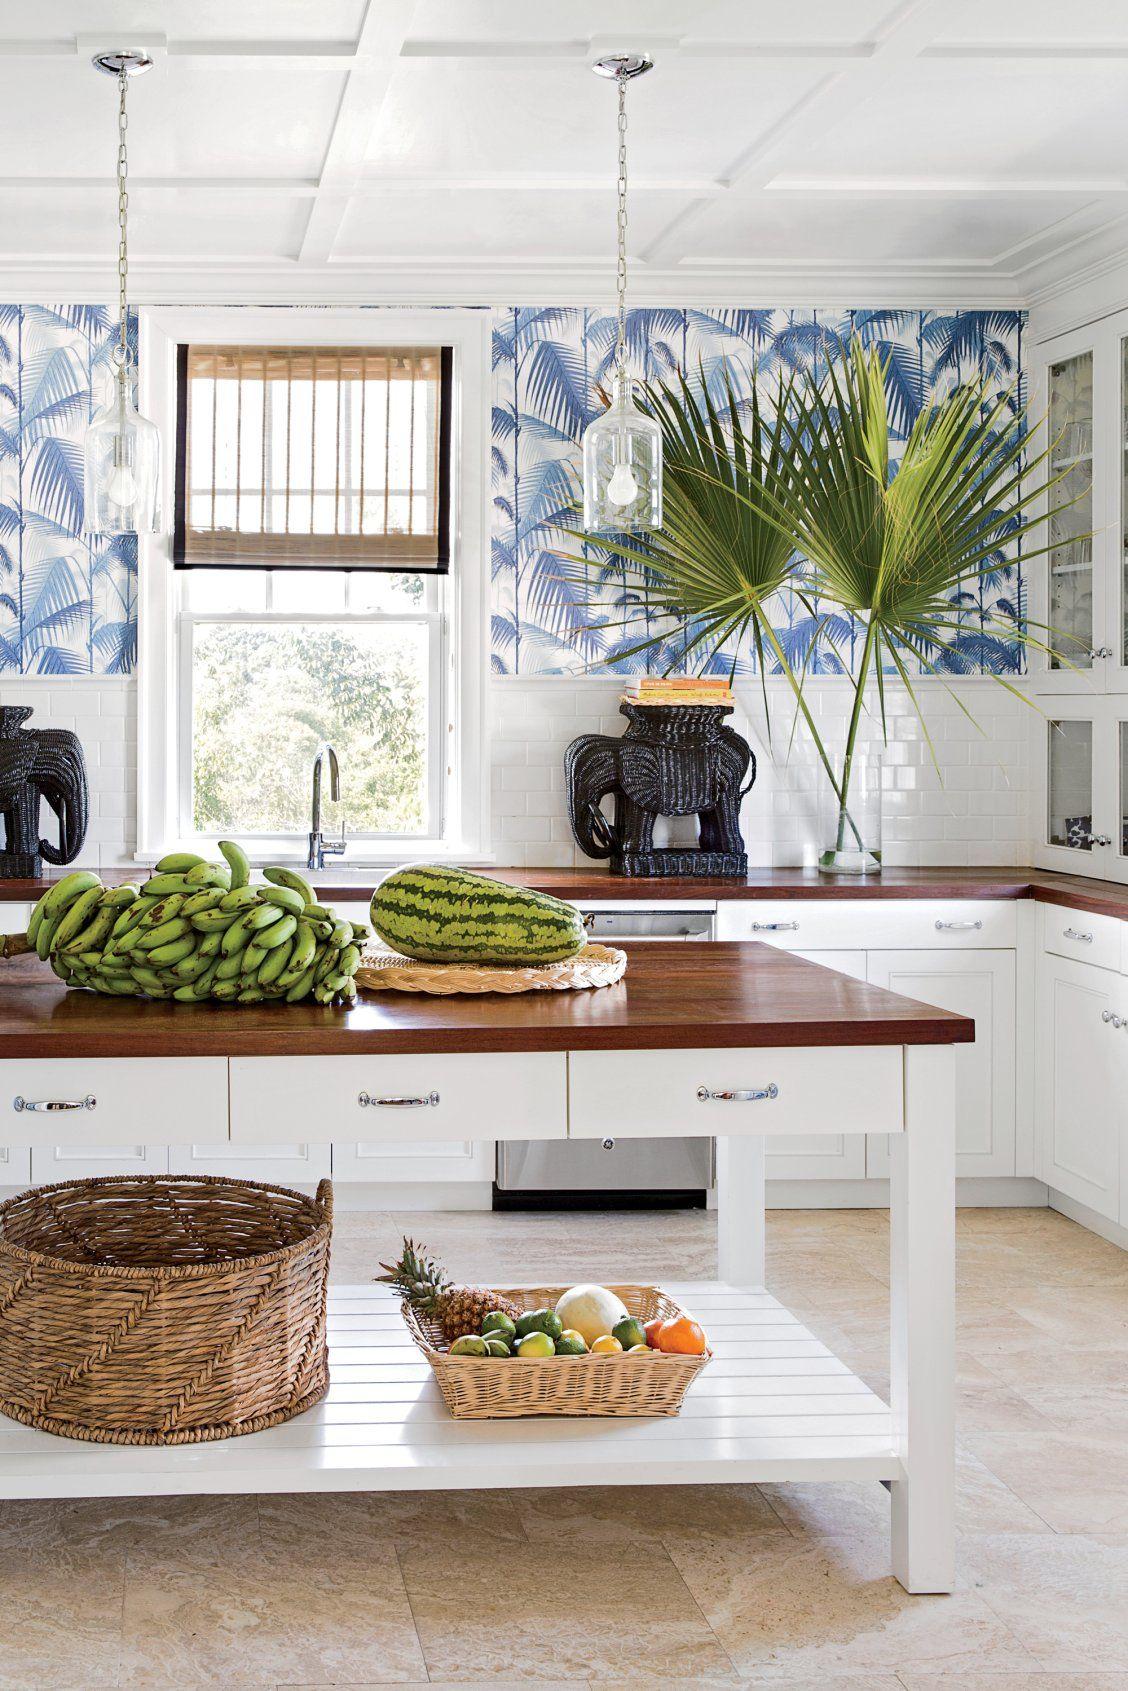 Tropical Kitchen Decor: 10 Beautiful White Beach House Kitchens